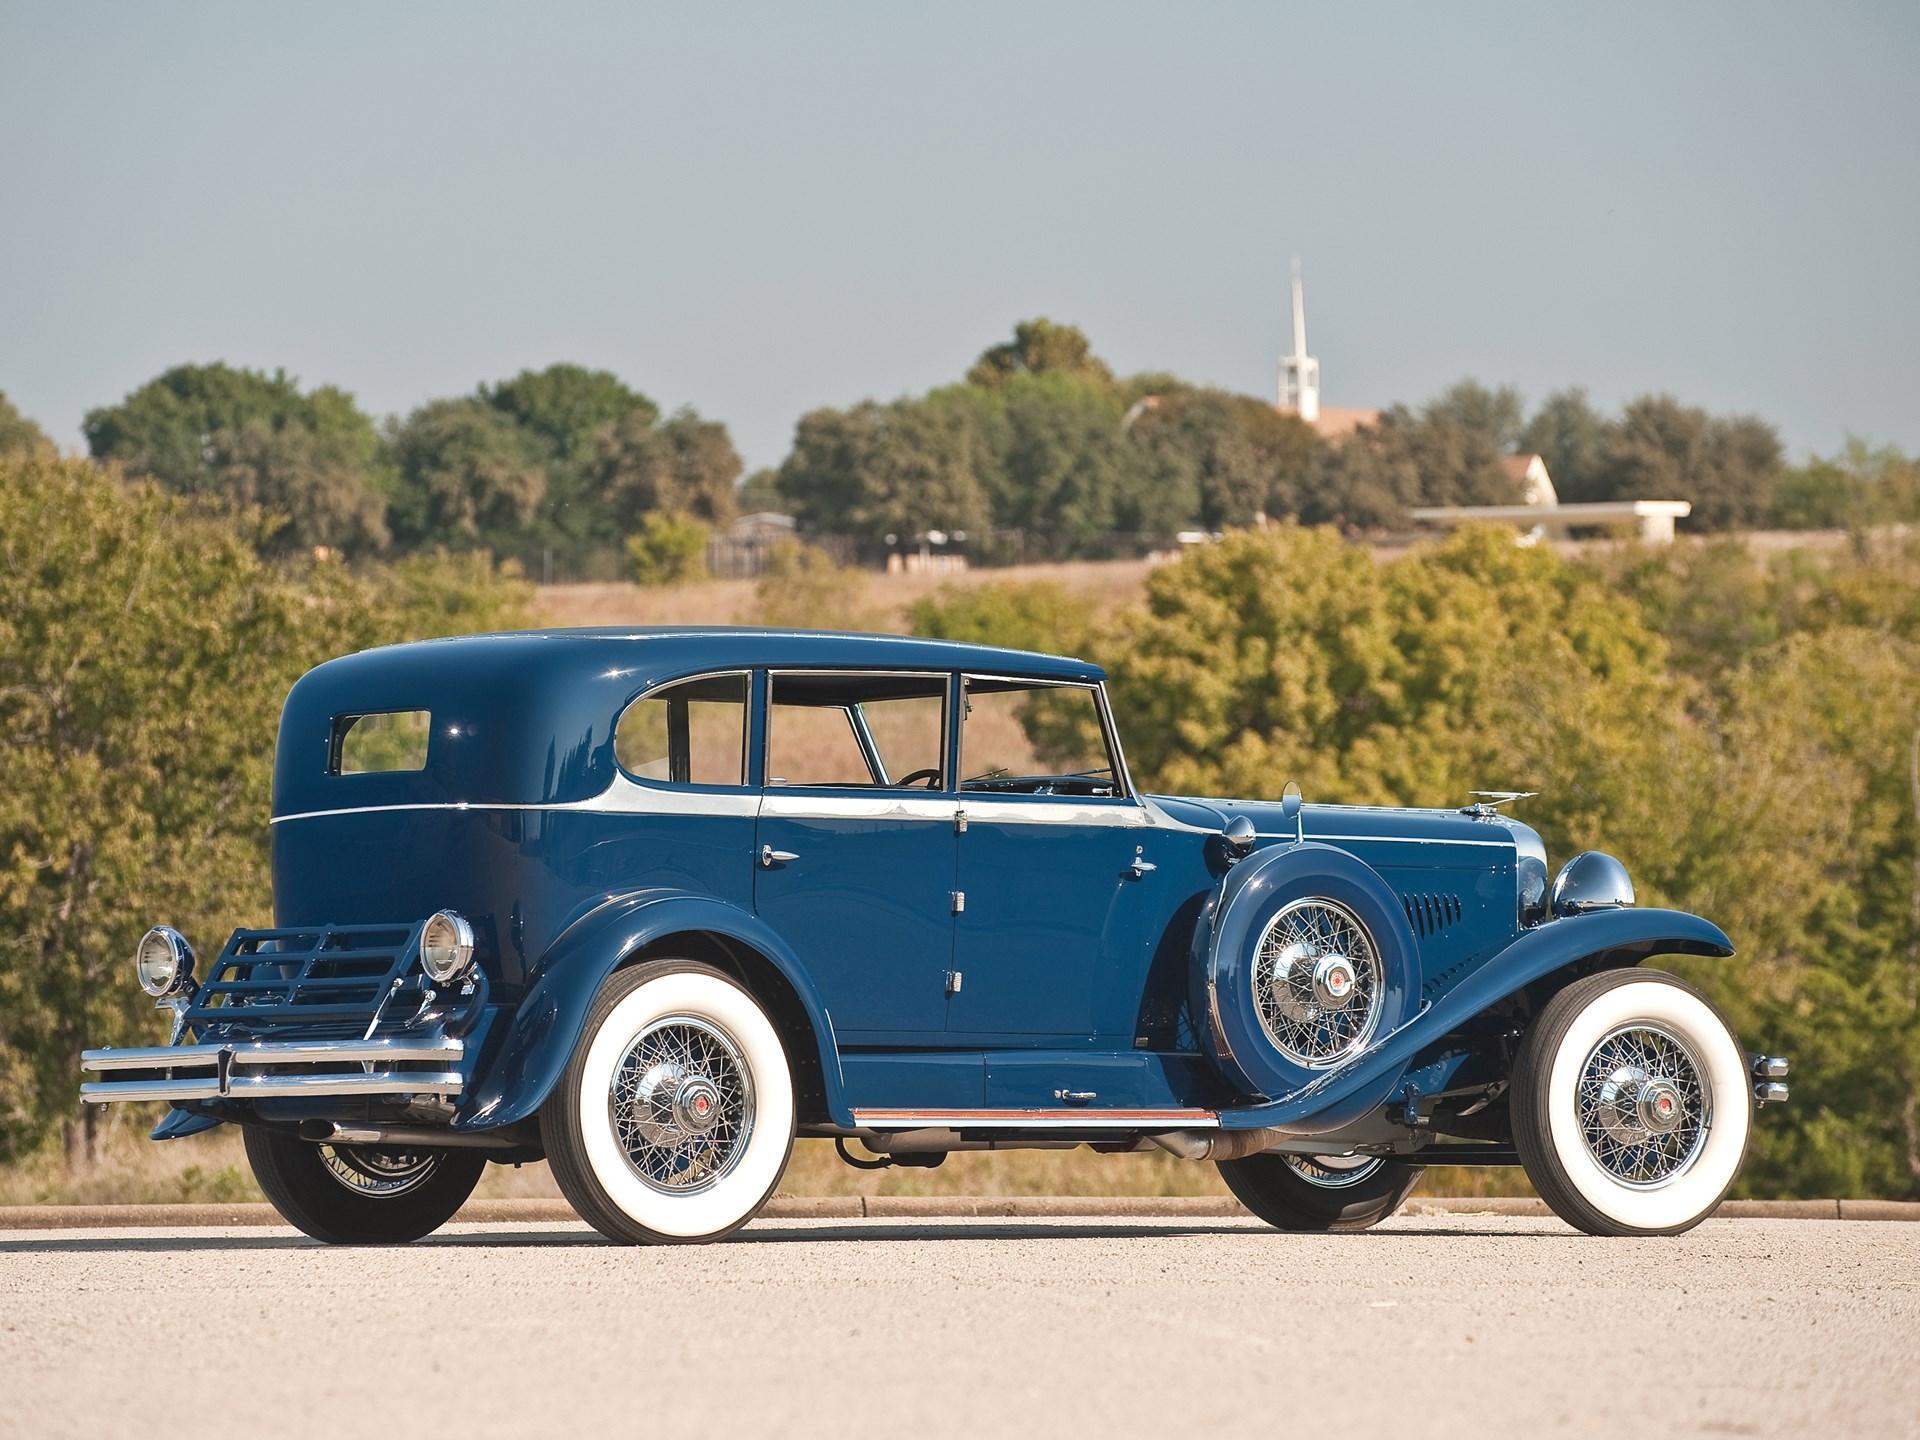 1929 Duesenberg Model J 'Clear-Vision' Sedan by Murphy